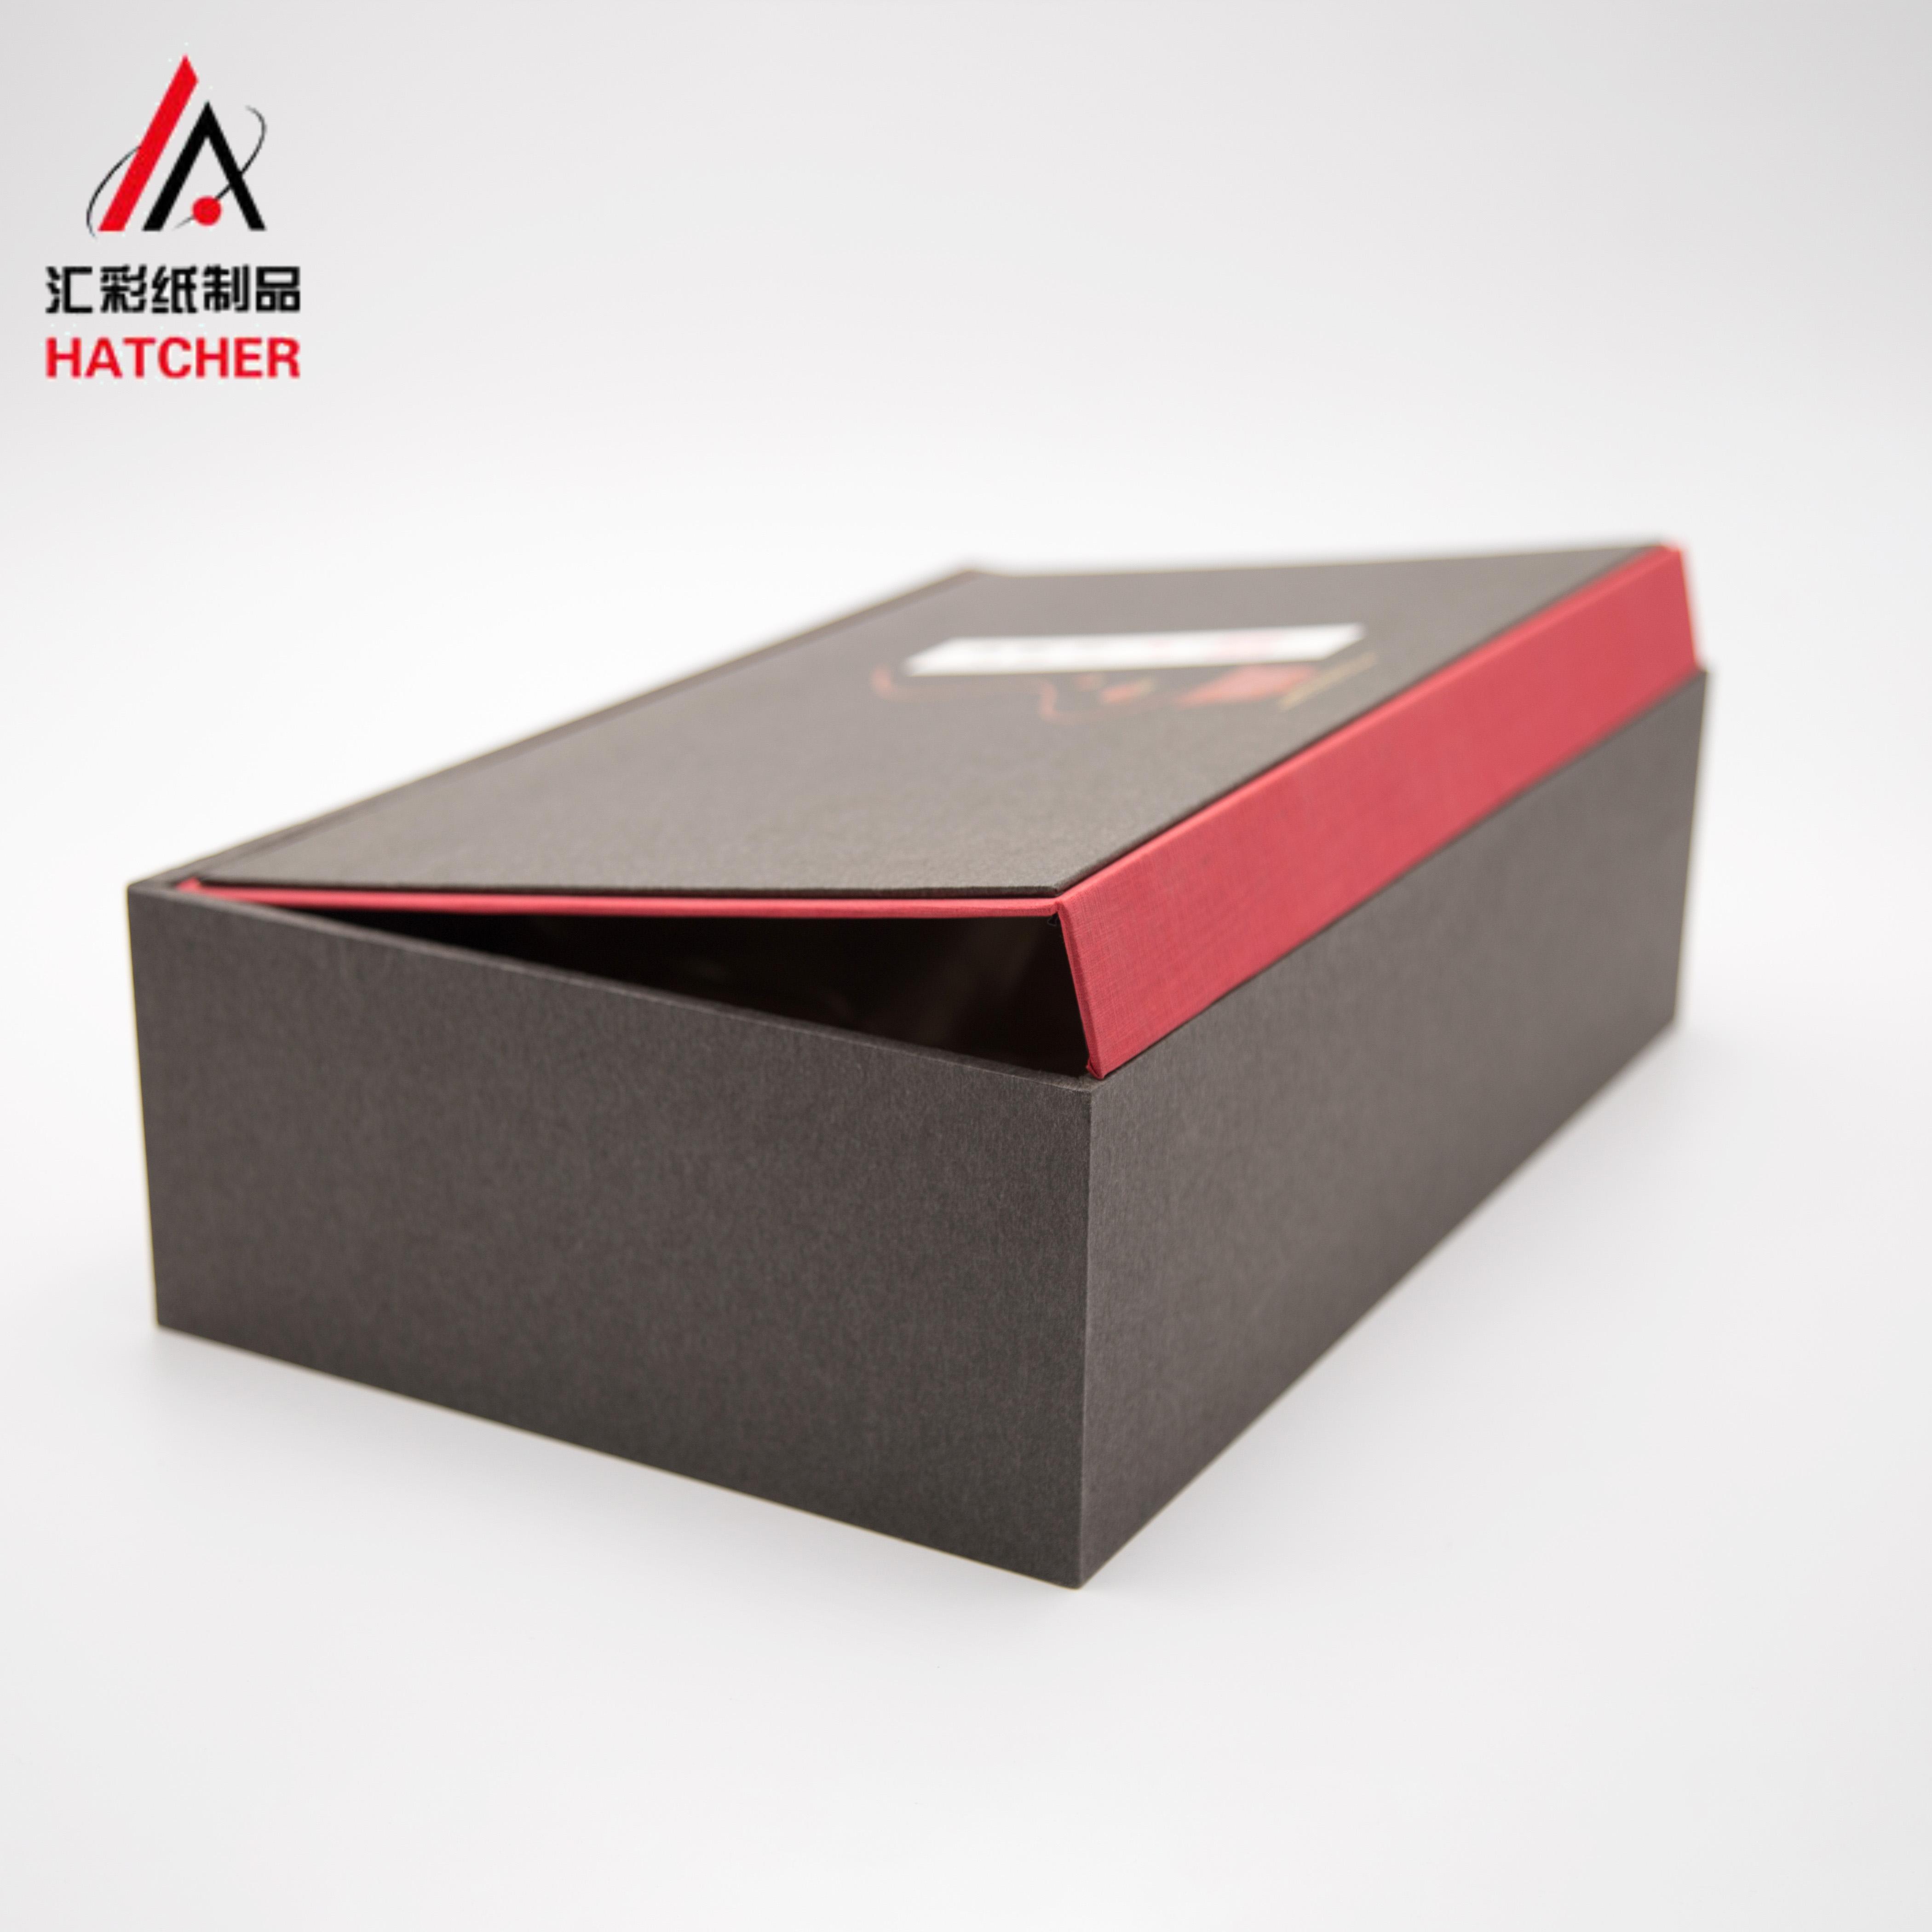 New Era High Quality Compartments Mockup Design Magnetic Closure